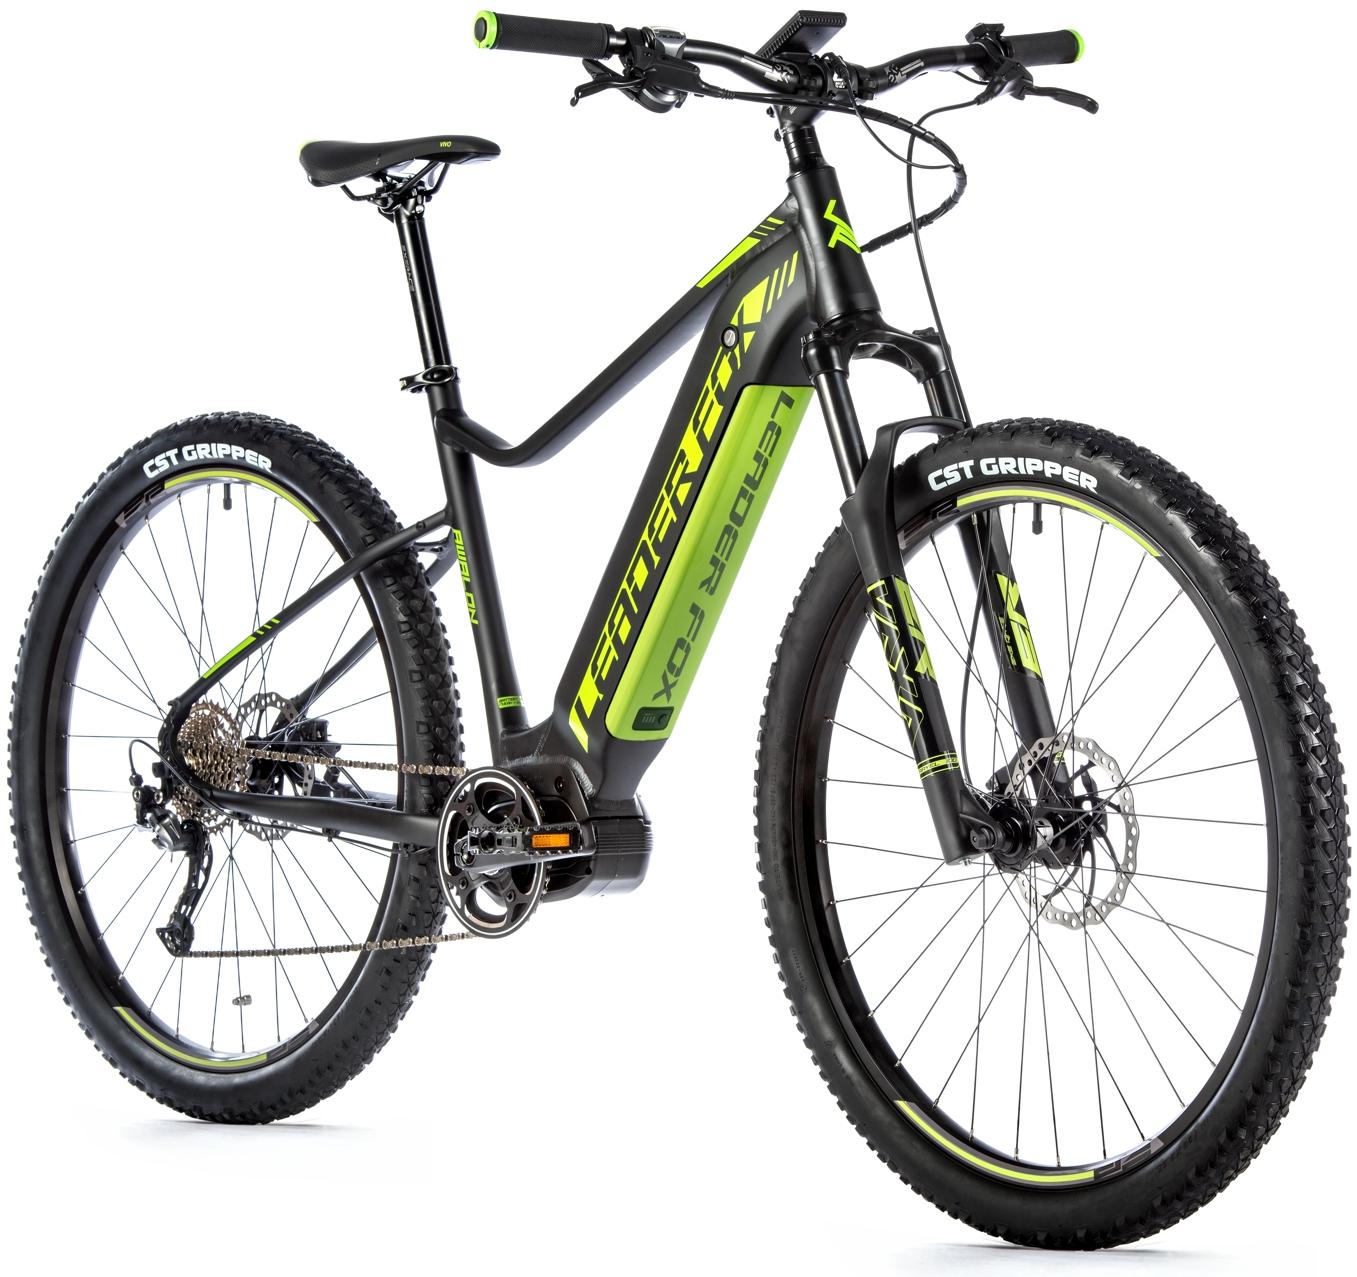 Bicicleta electrica MTB Leader Fox Awalon Gent 29 inch, 2020